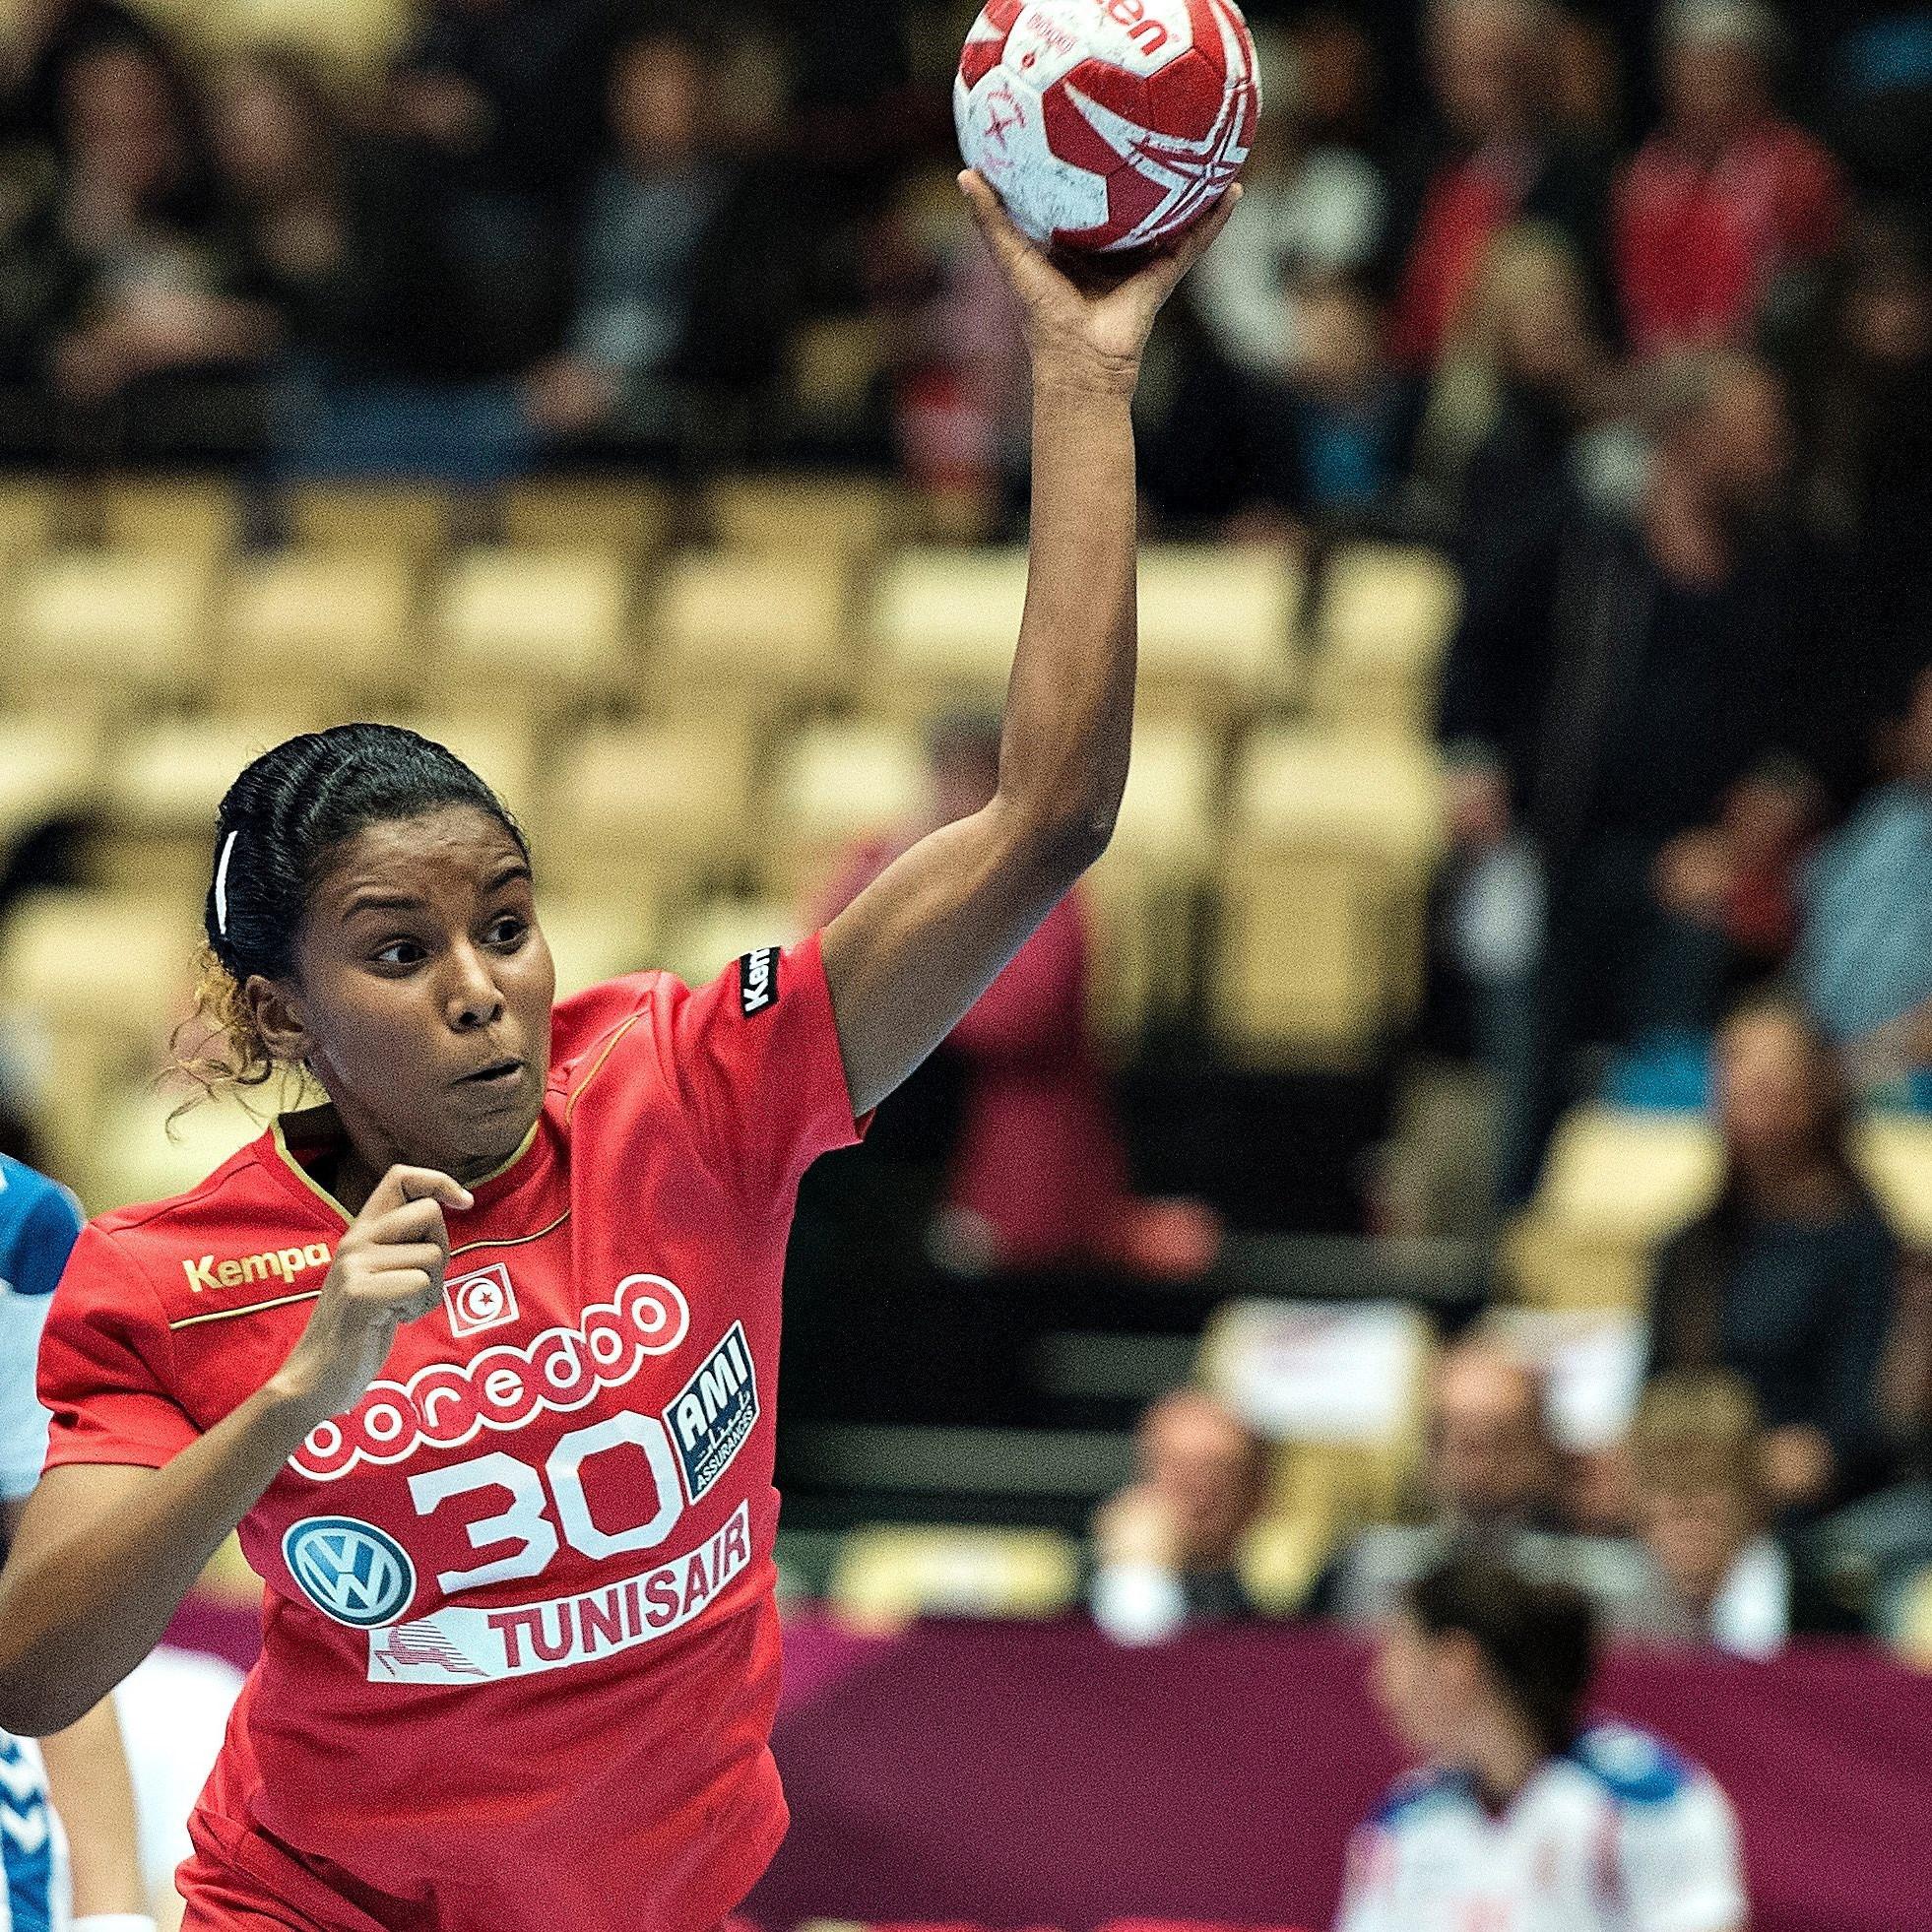 Guinea's first win earns quarter-final place at African Women's Handball Championship